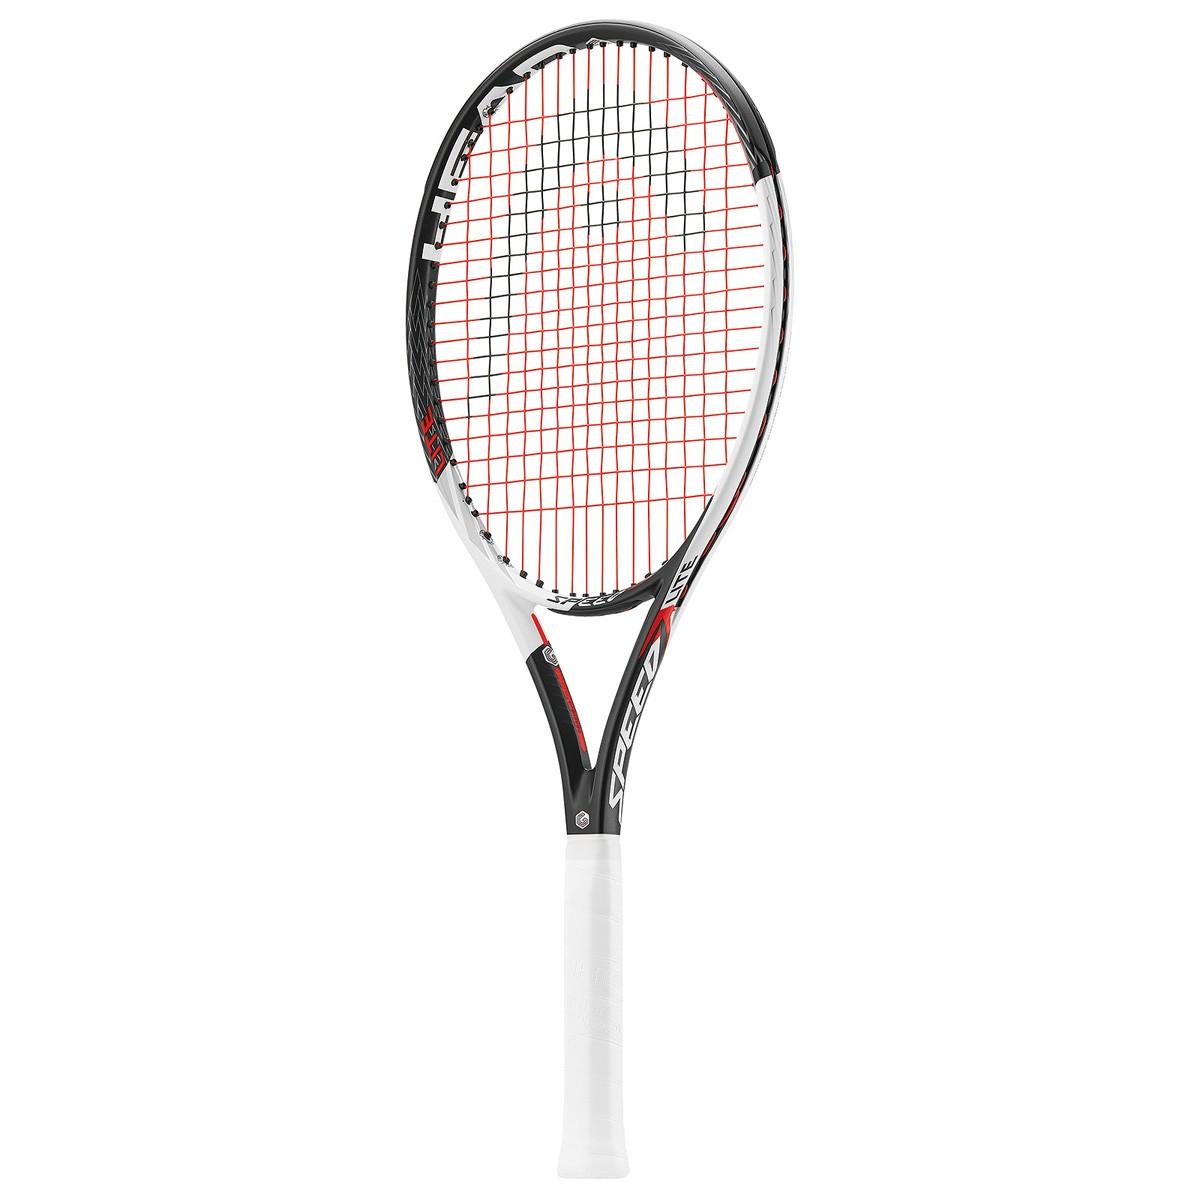 Rakieta tenisowa Head Graphene Touch Speed LITE + Lynx